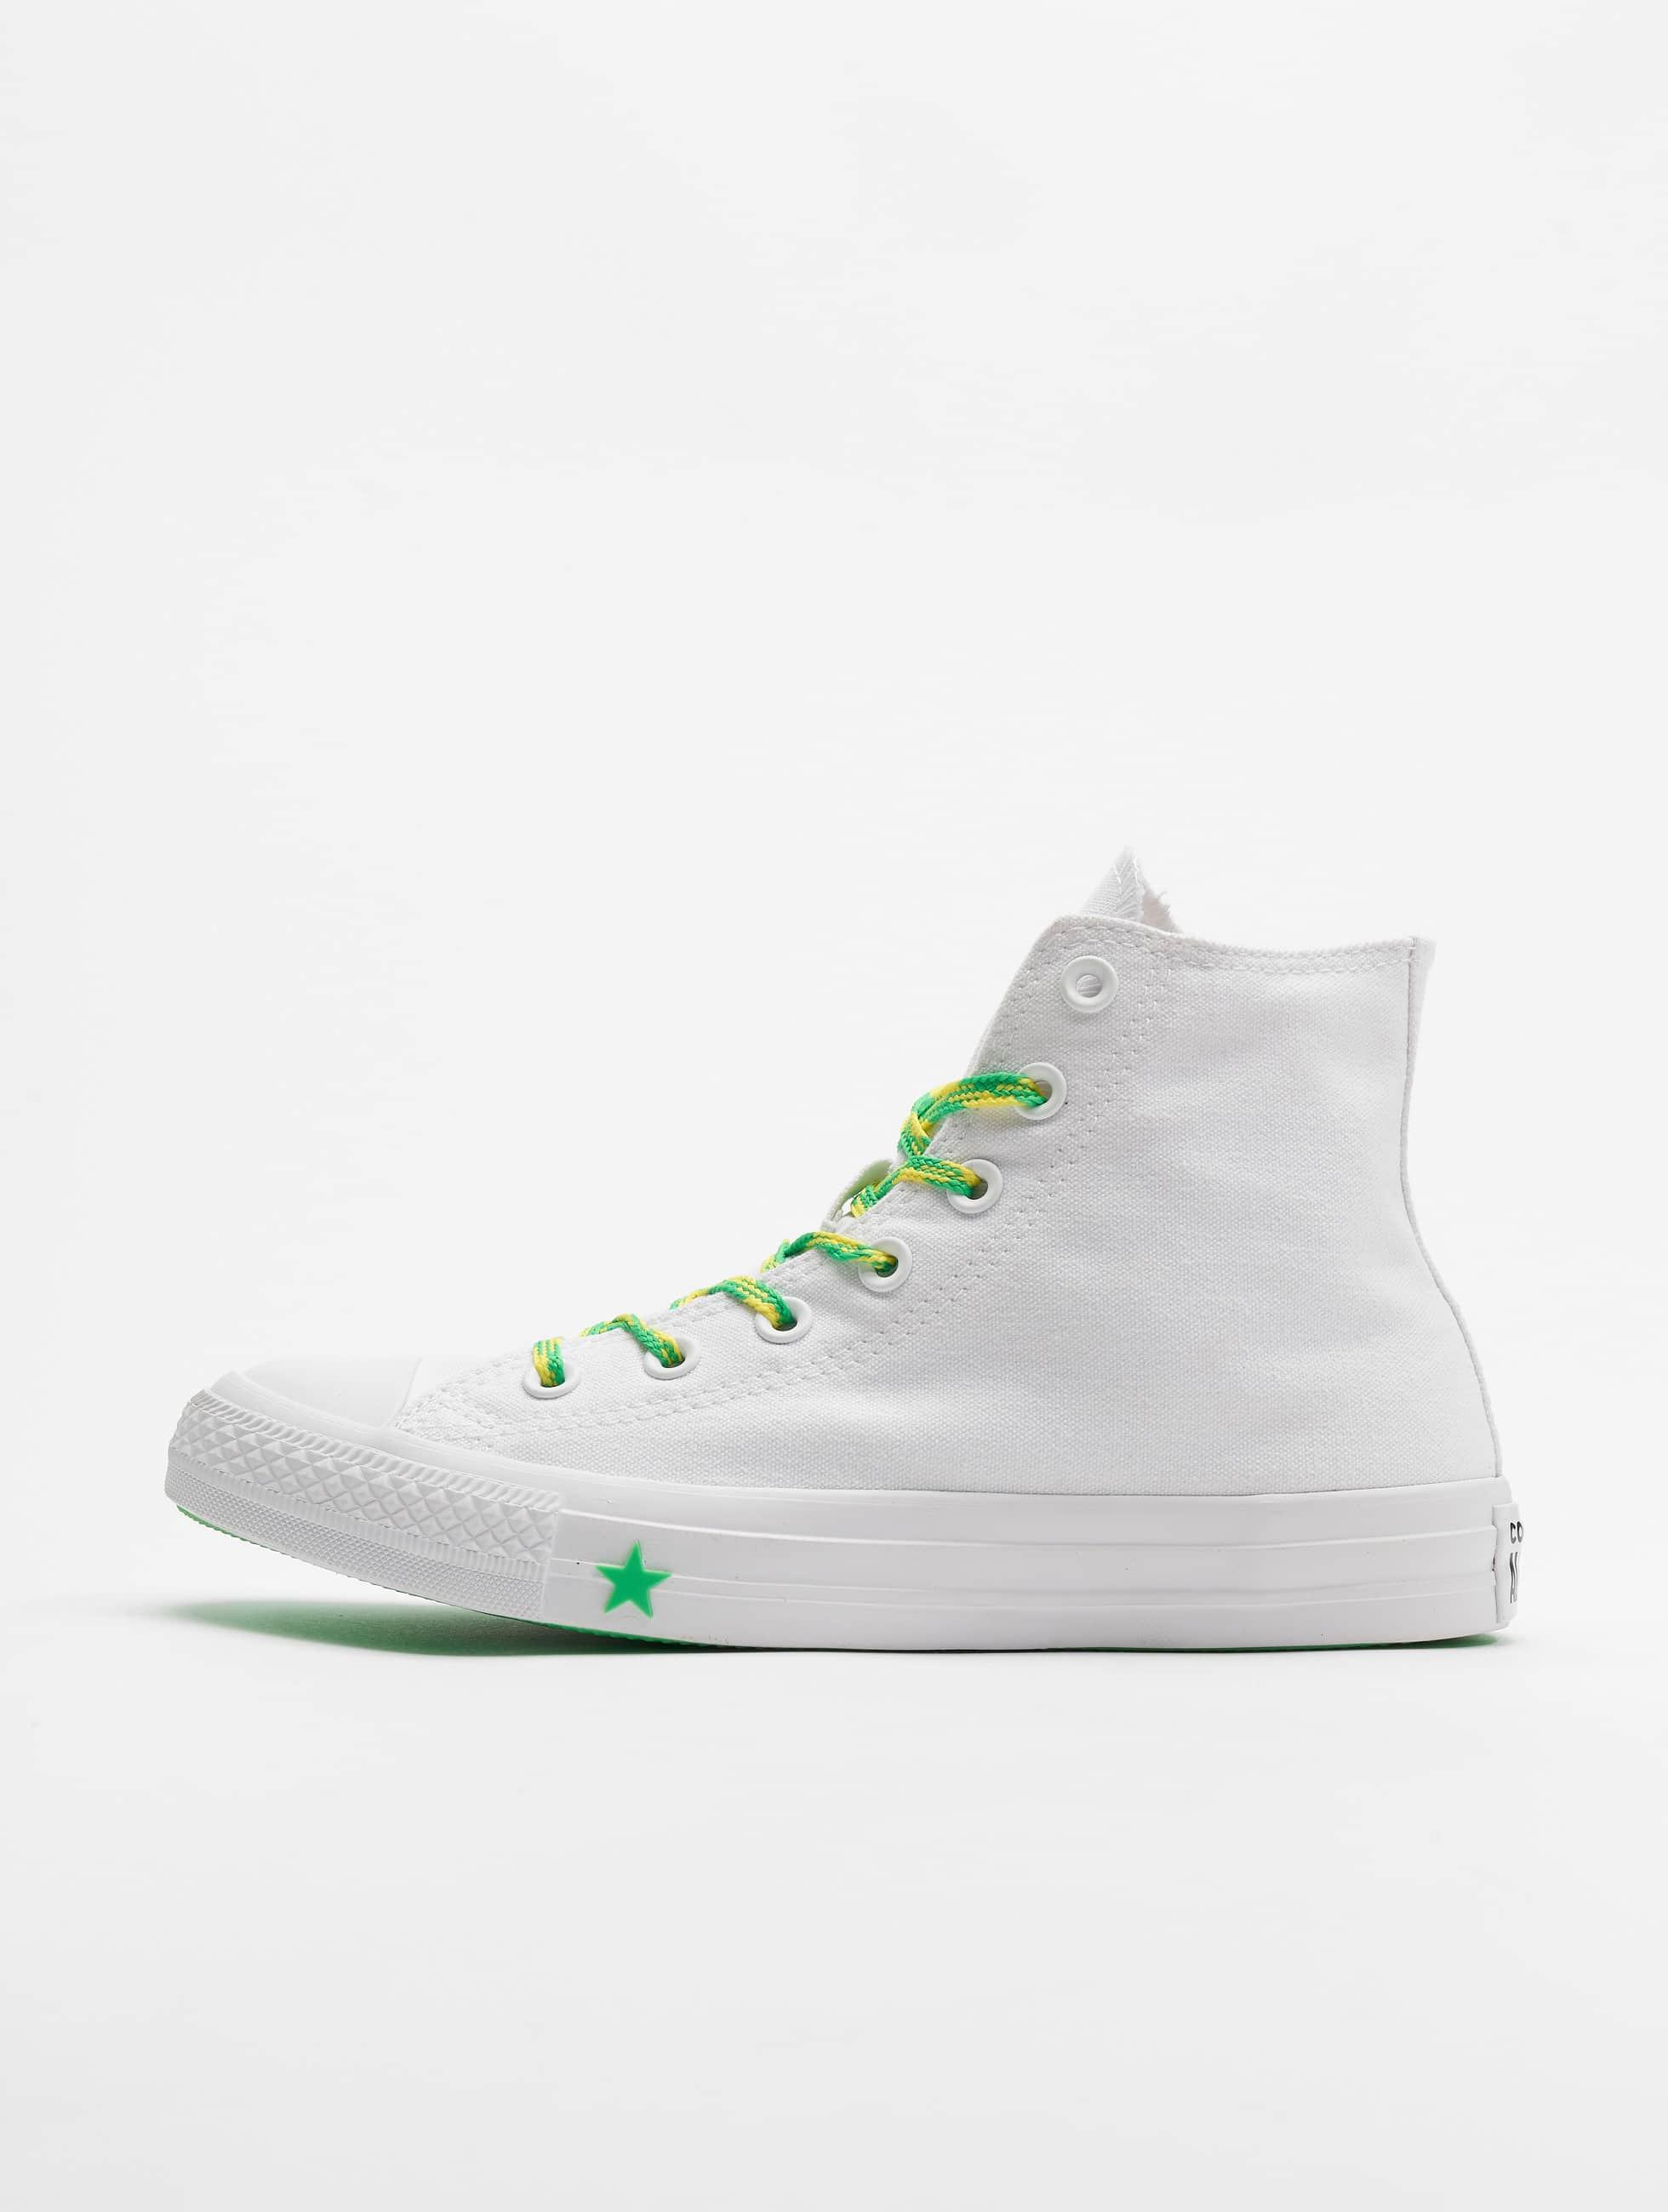 Converse Chuck Tailor All Star Hi Sneakers WhiteAcid GreenFresh Yellow